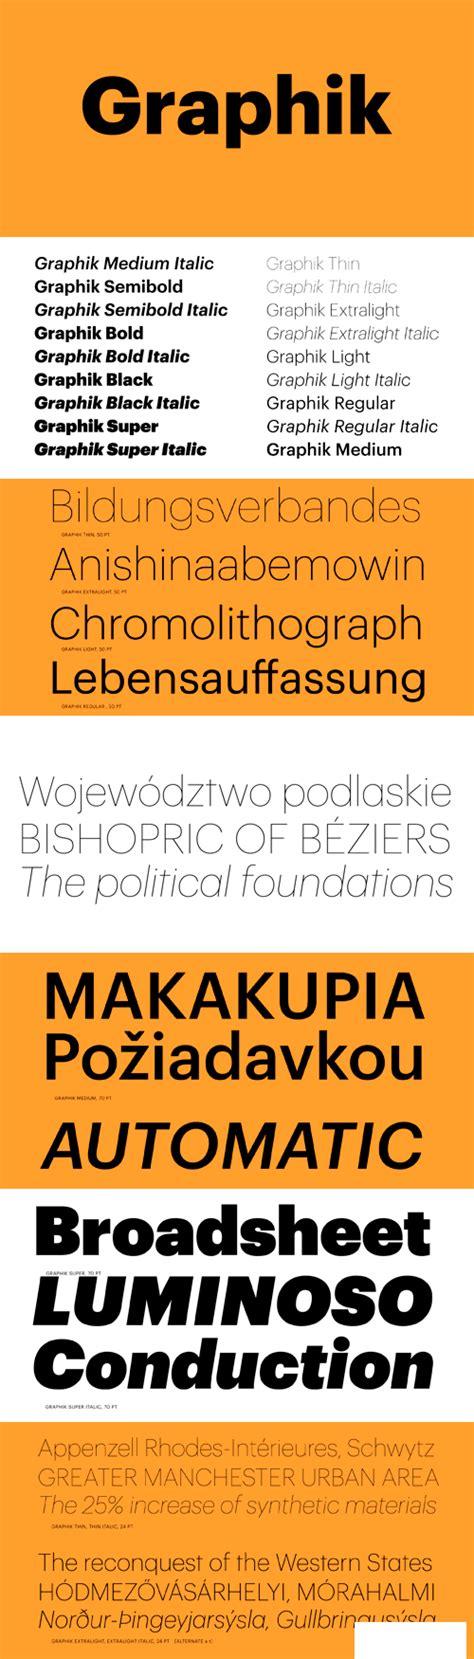 Graphik Bold Font Free Download